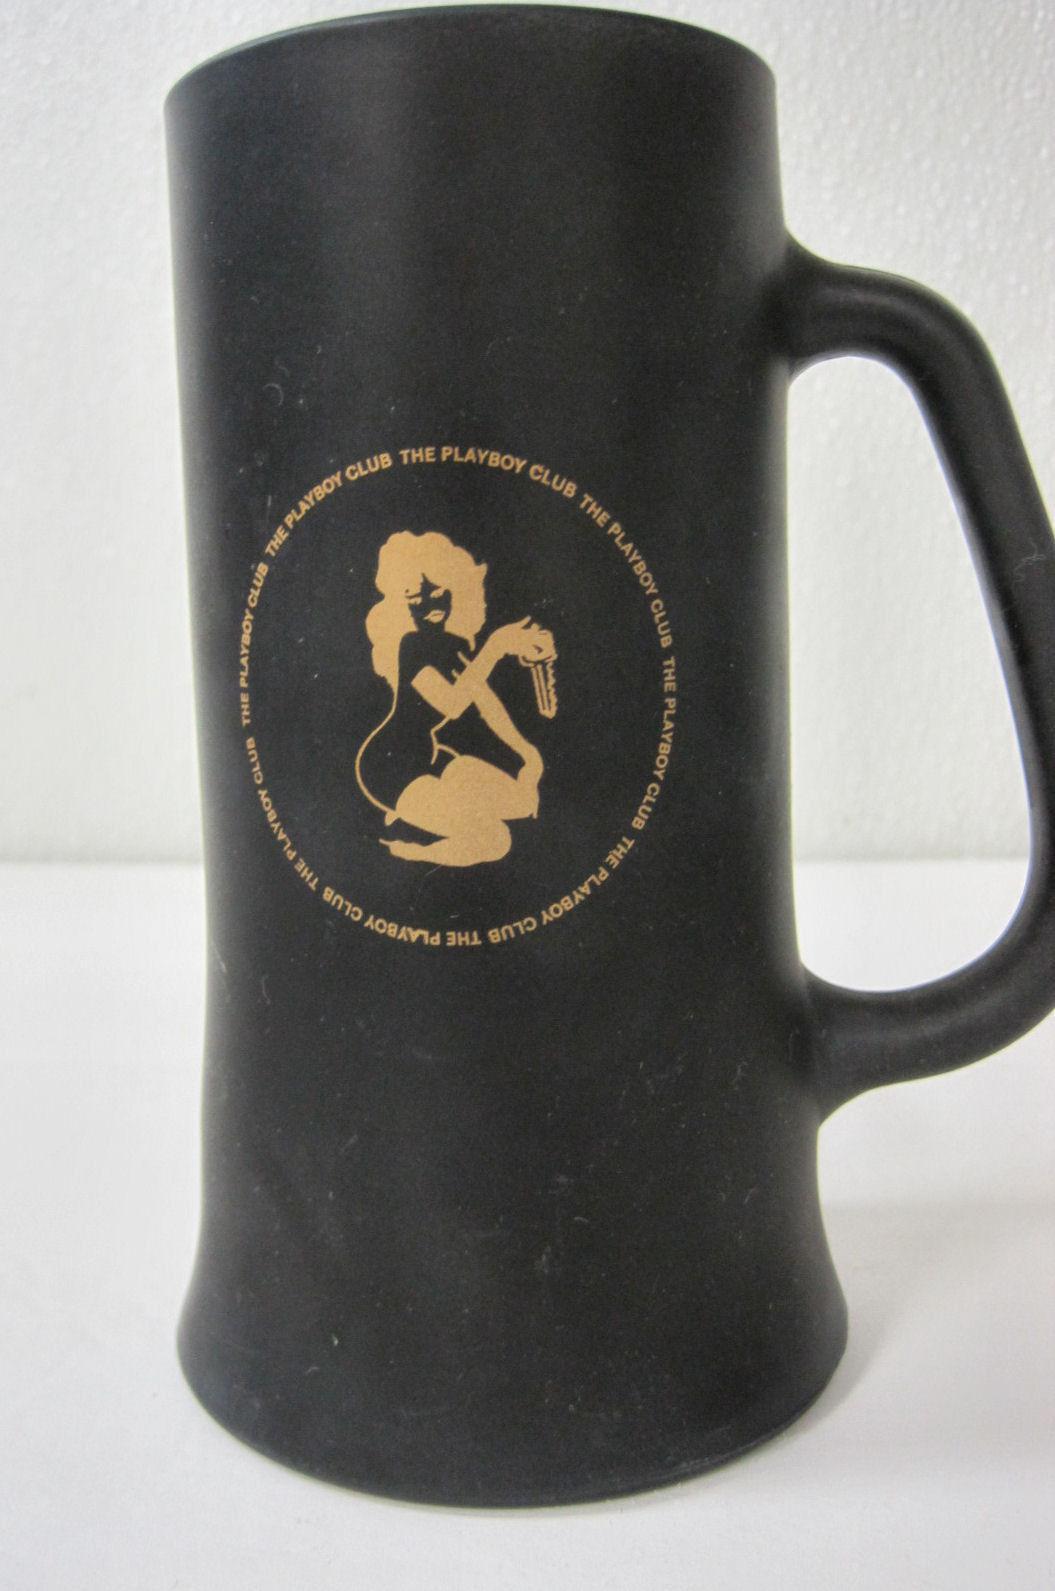 Playboy Bunny Club Key Glass Black Gold Beer Cup Mug Tanker 6 Inches Tall